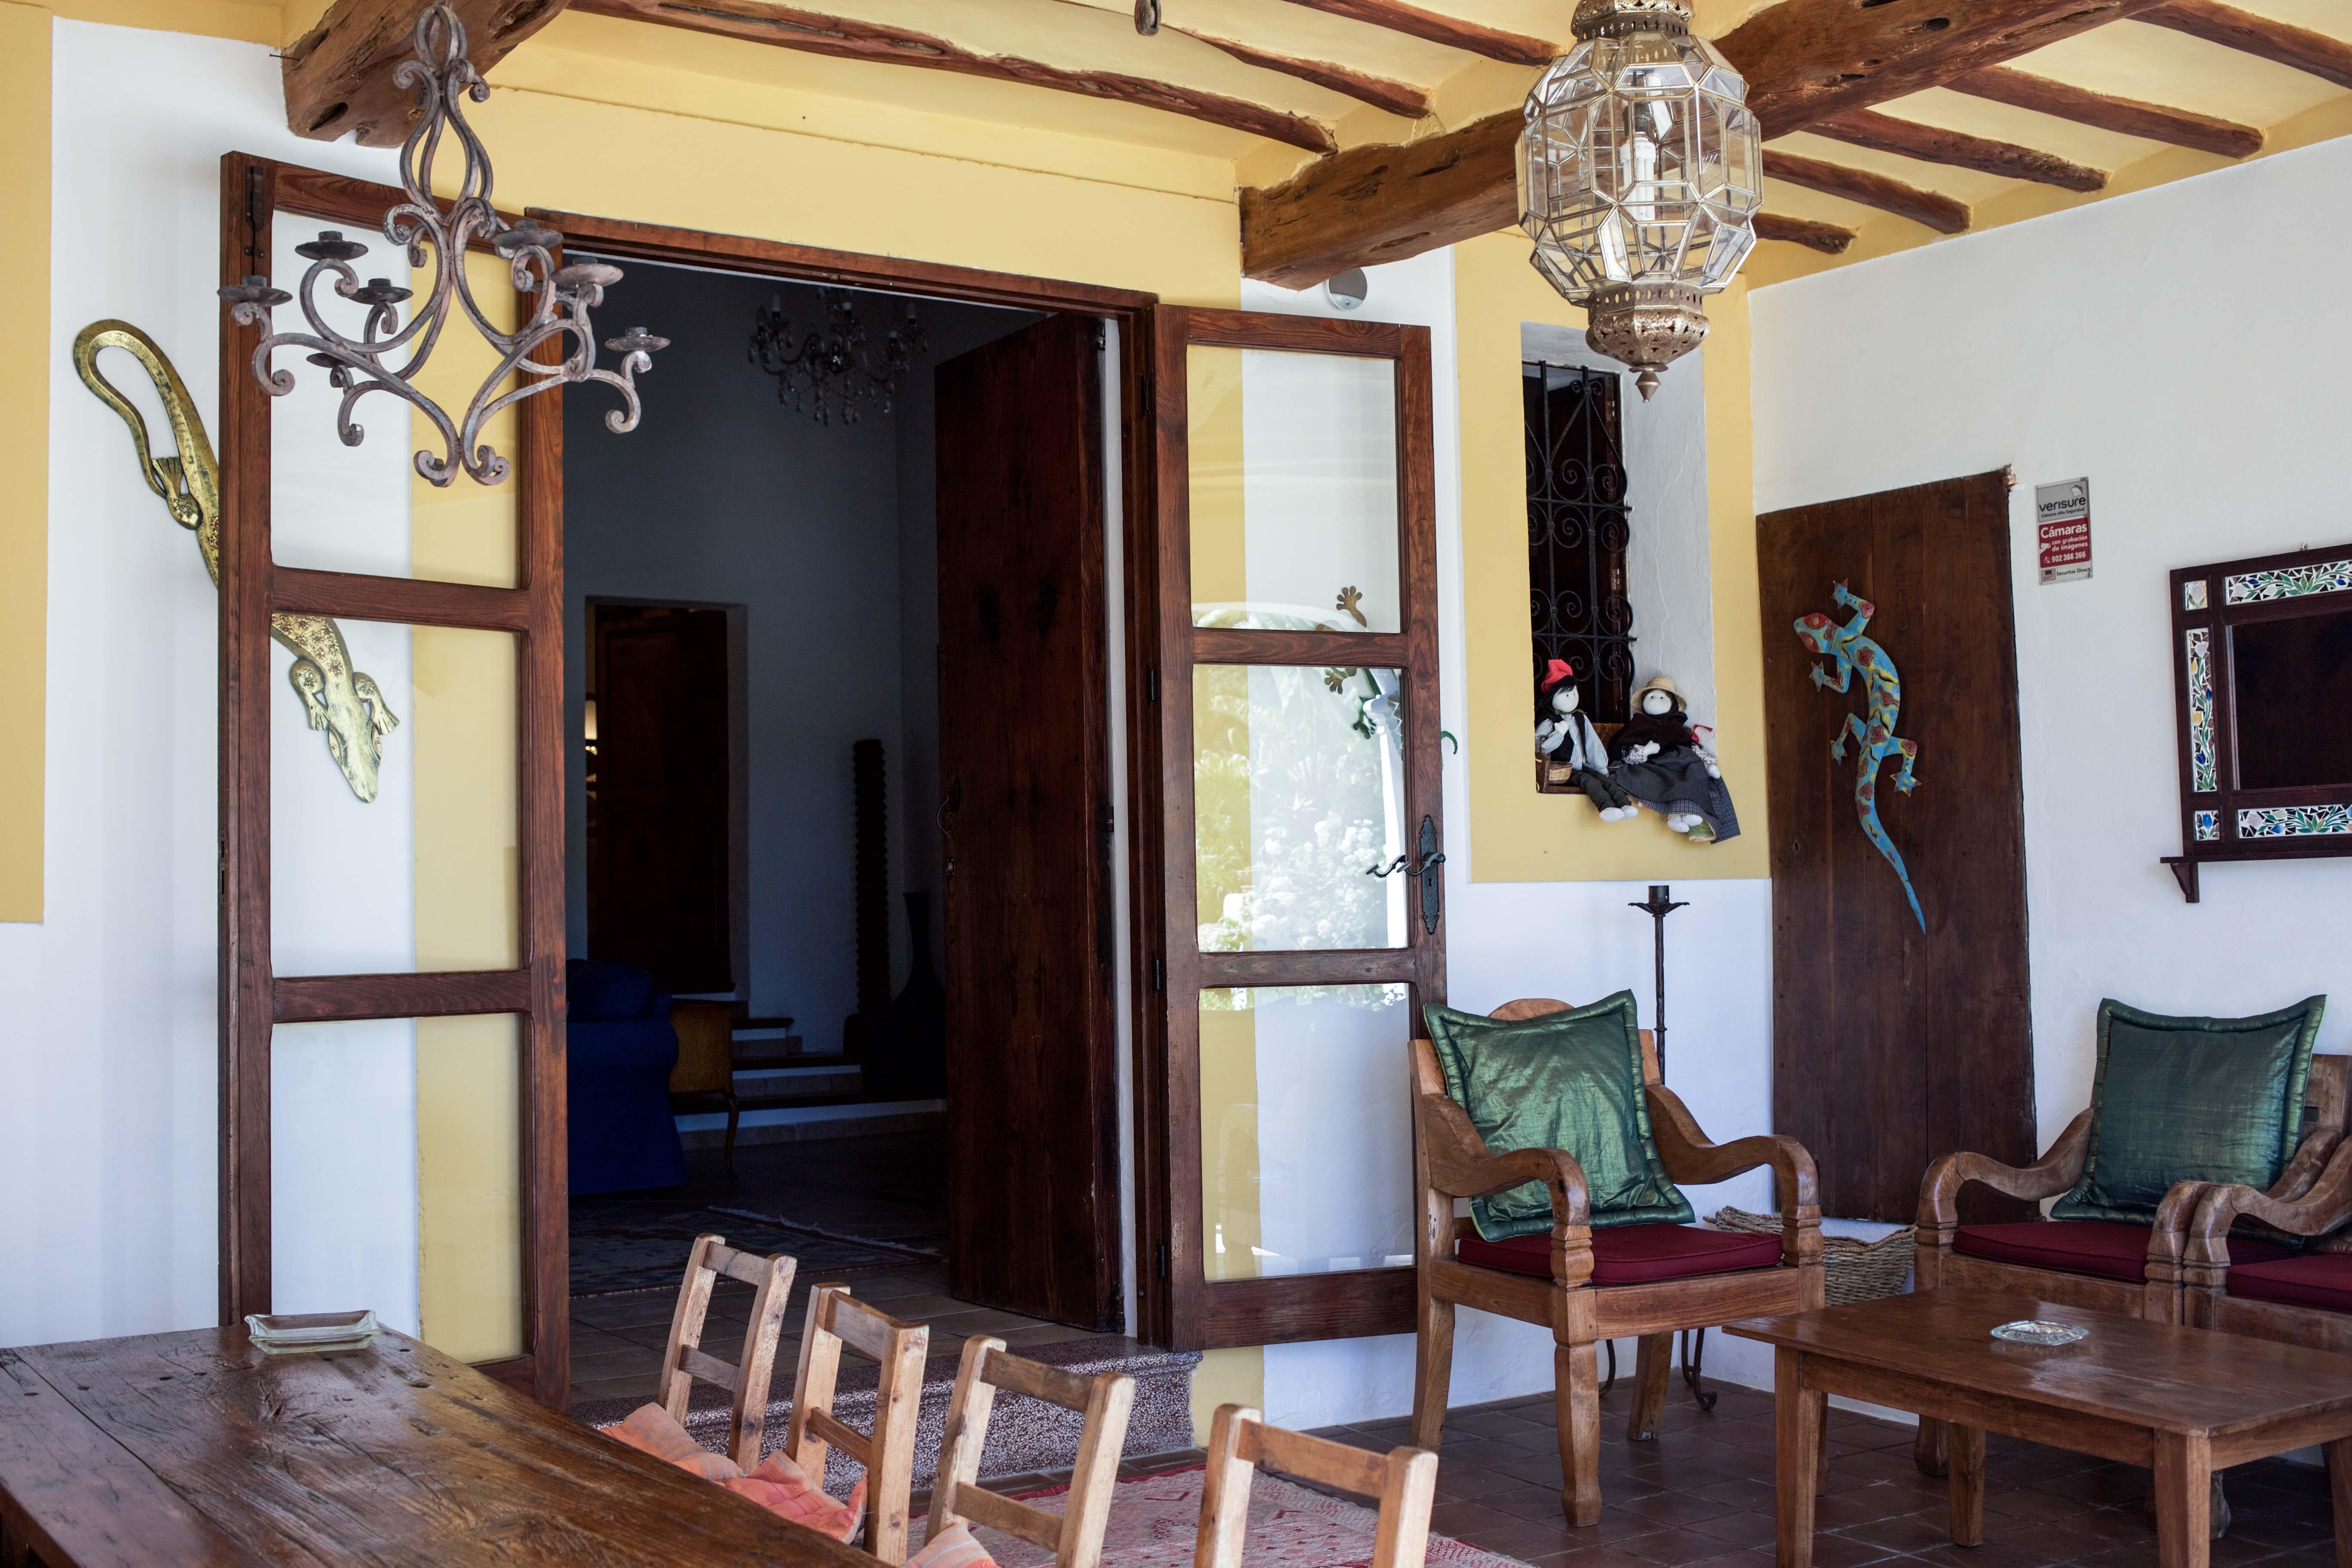 travelblog-reiseblog-ibiza-kurztrip-mädelstrip-luxus-villa_9197